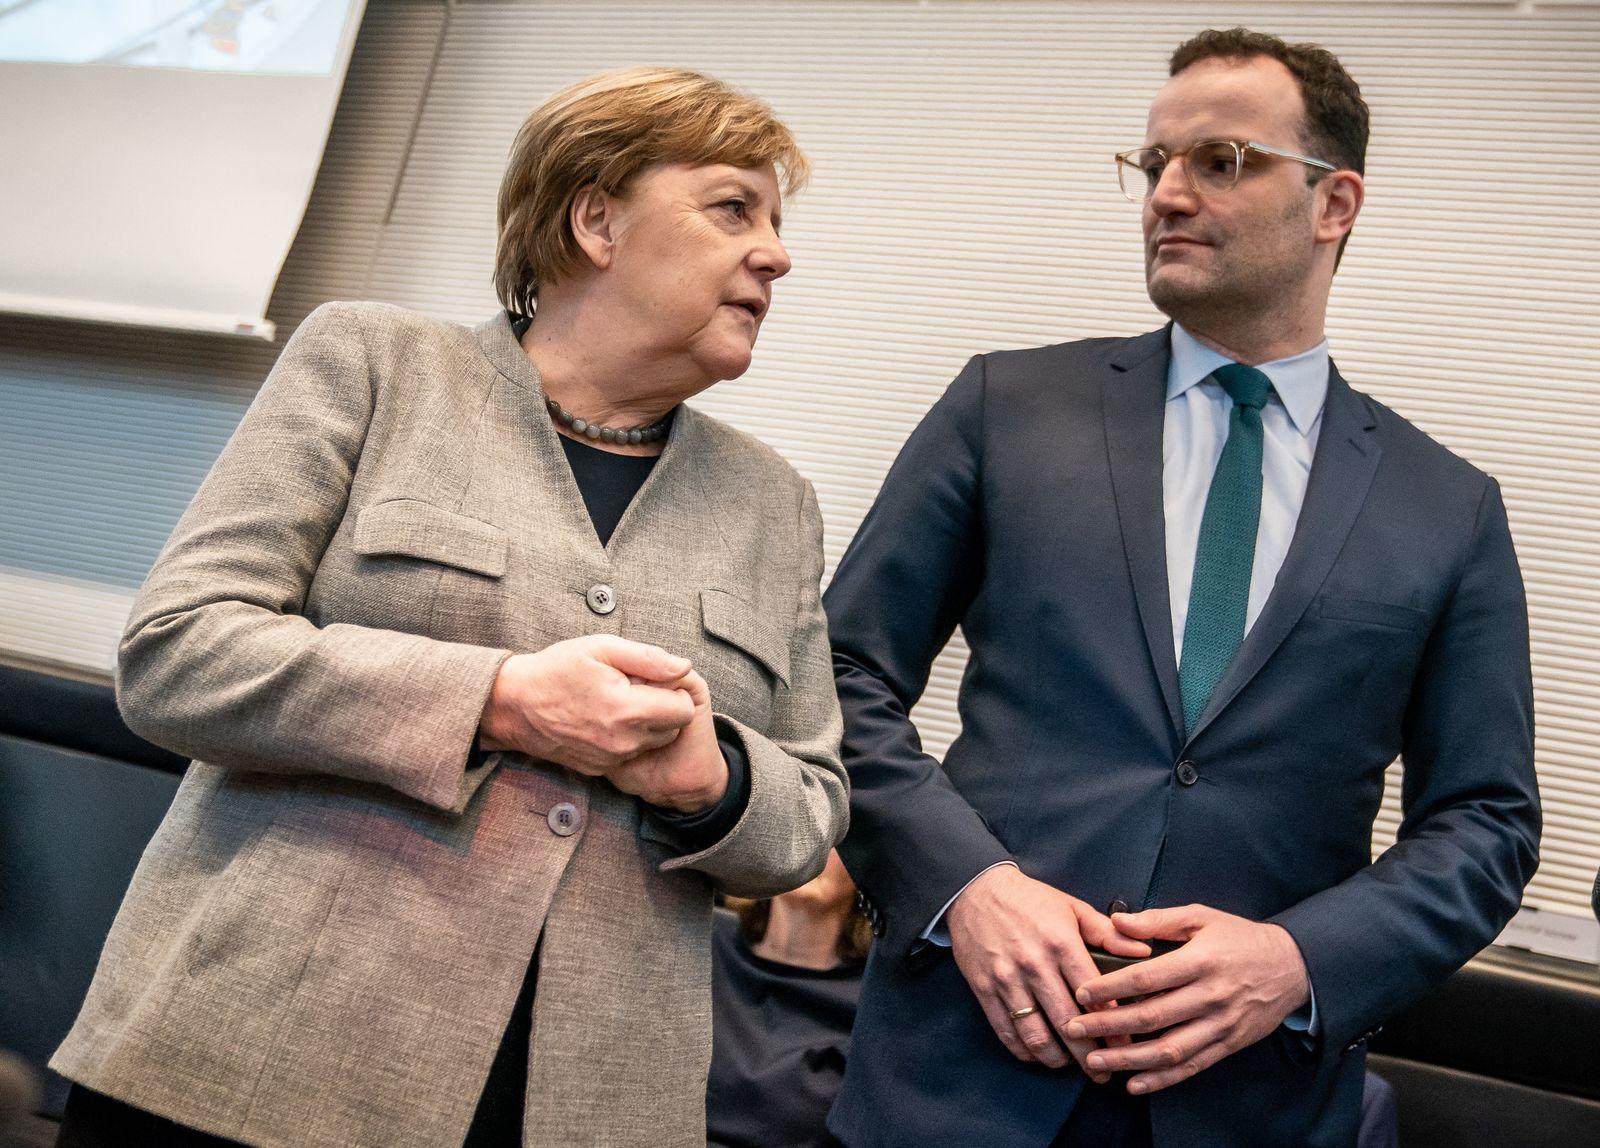 Angela Merkel / Jens Spahn / Coronavirus / CDU